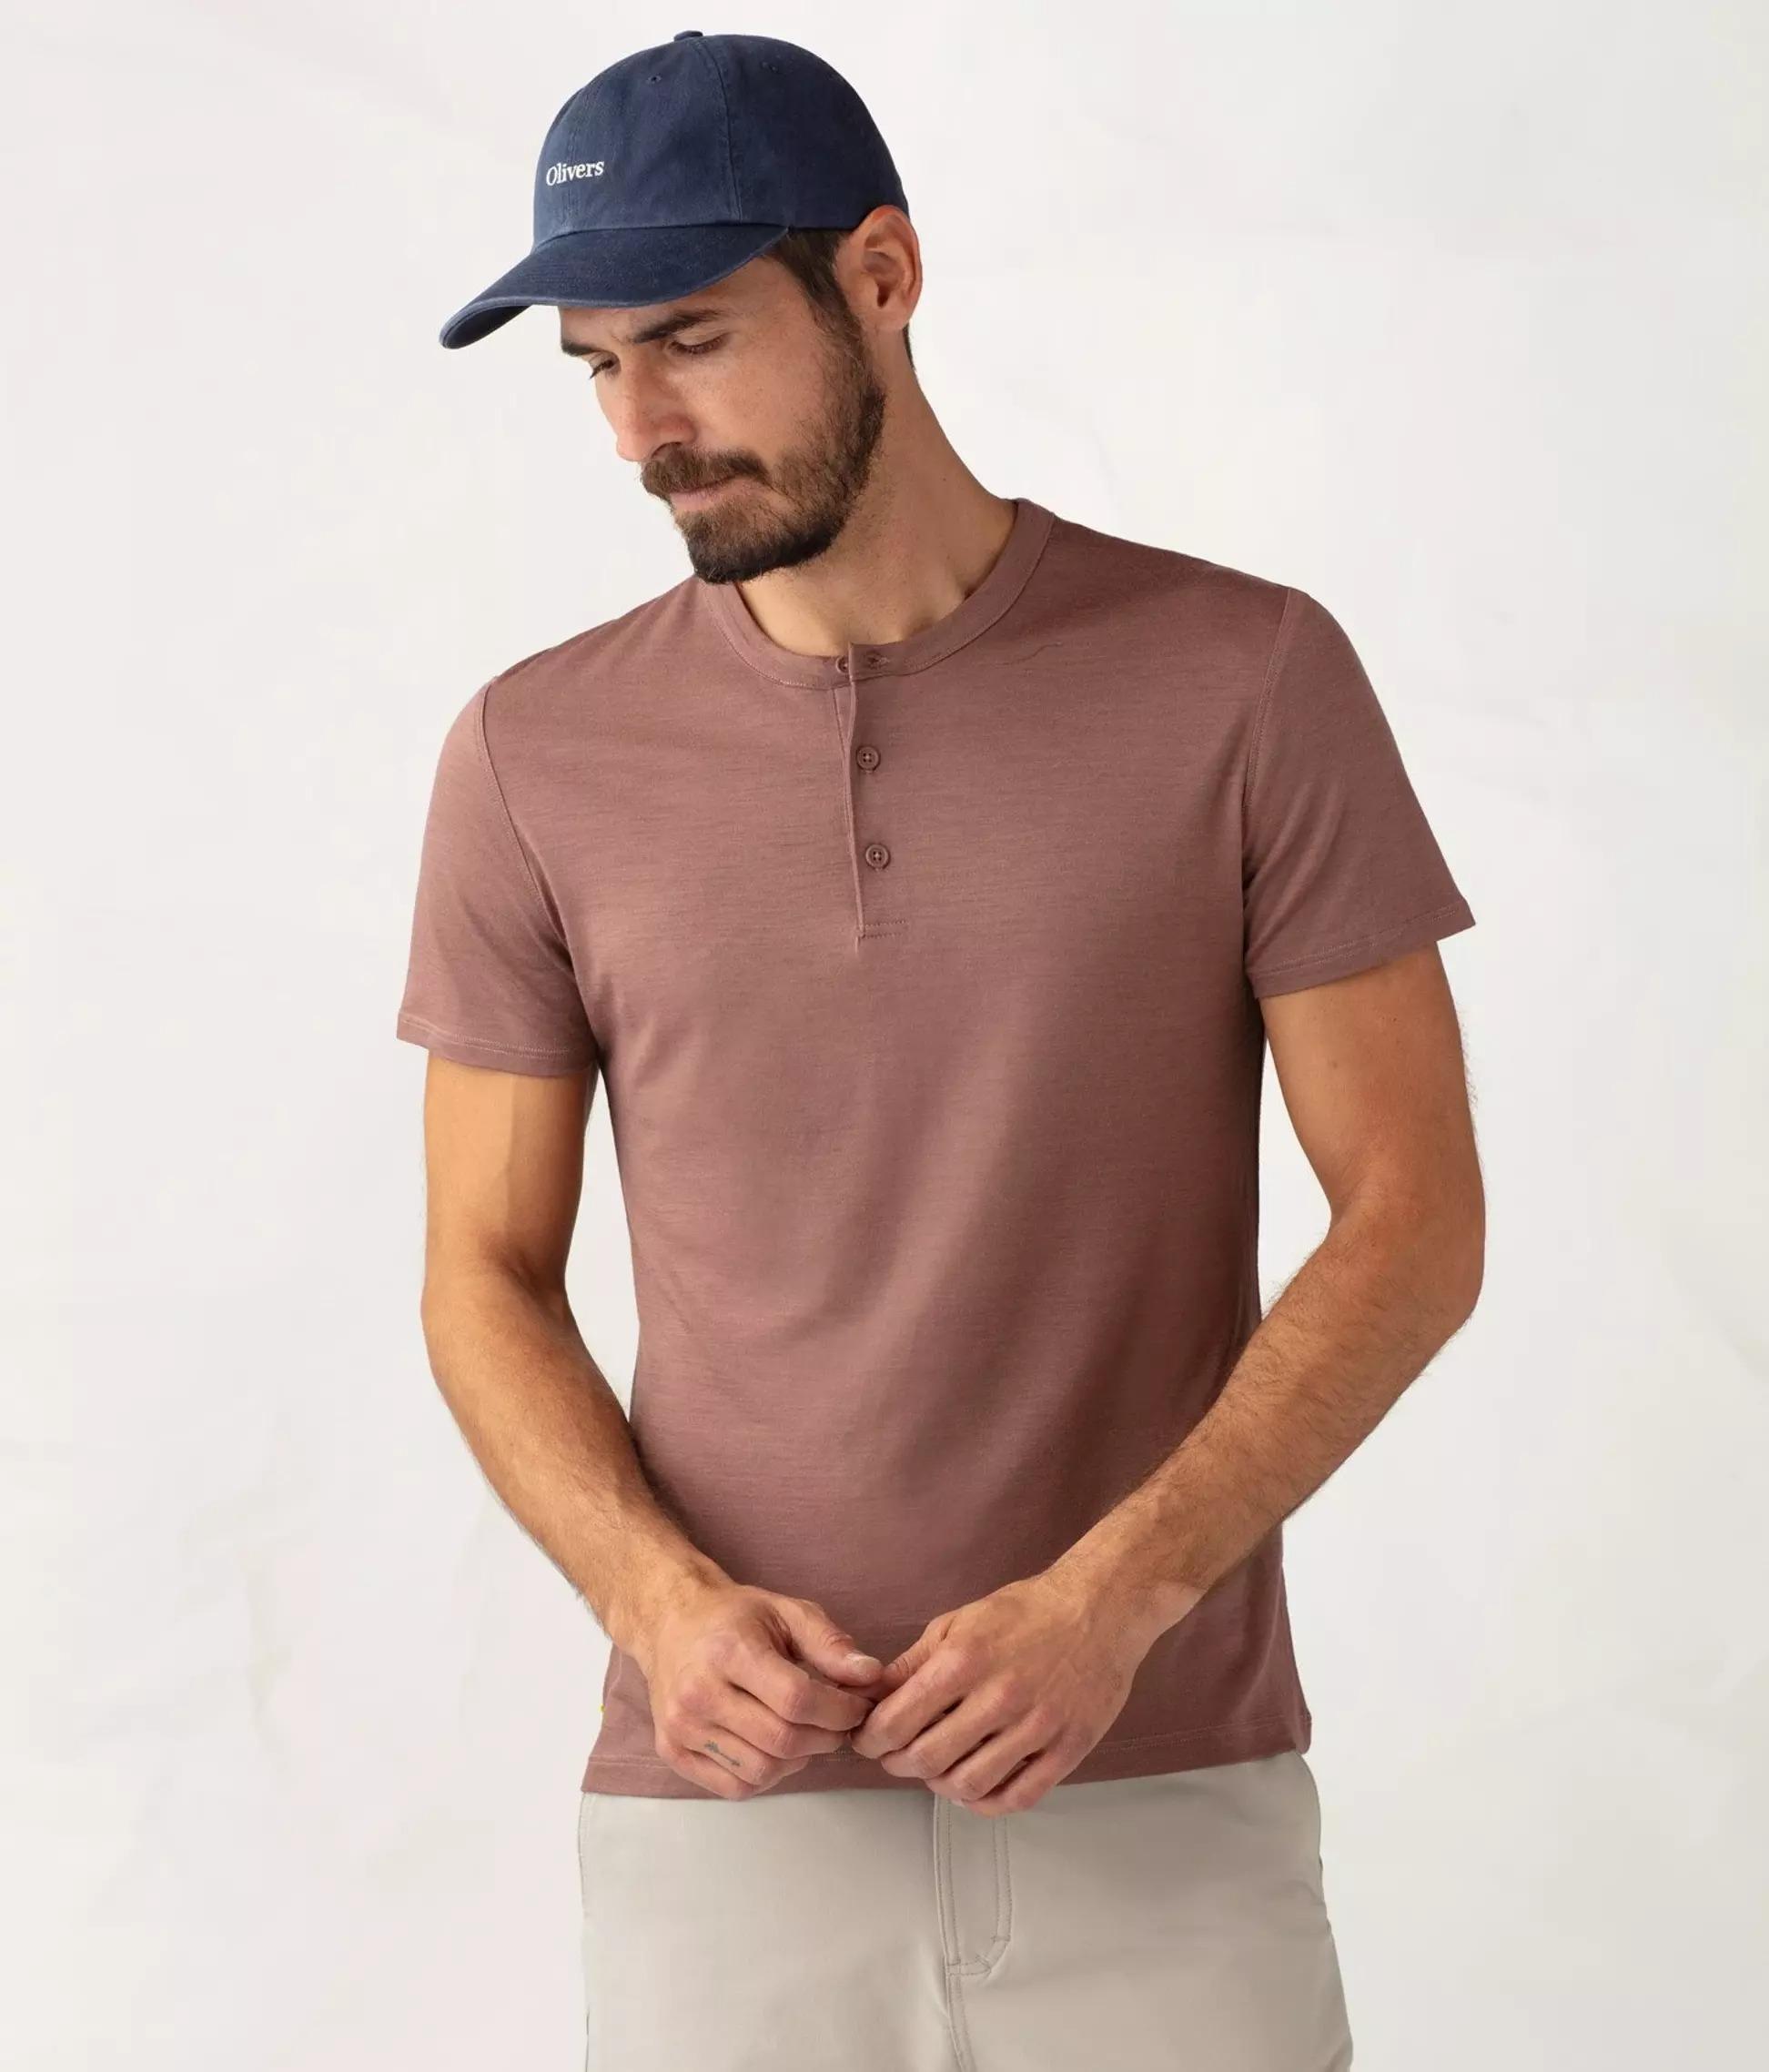 Man wears Olivers Apparel Convoy Short-Sleeve Henley shirt in terracotta